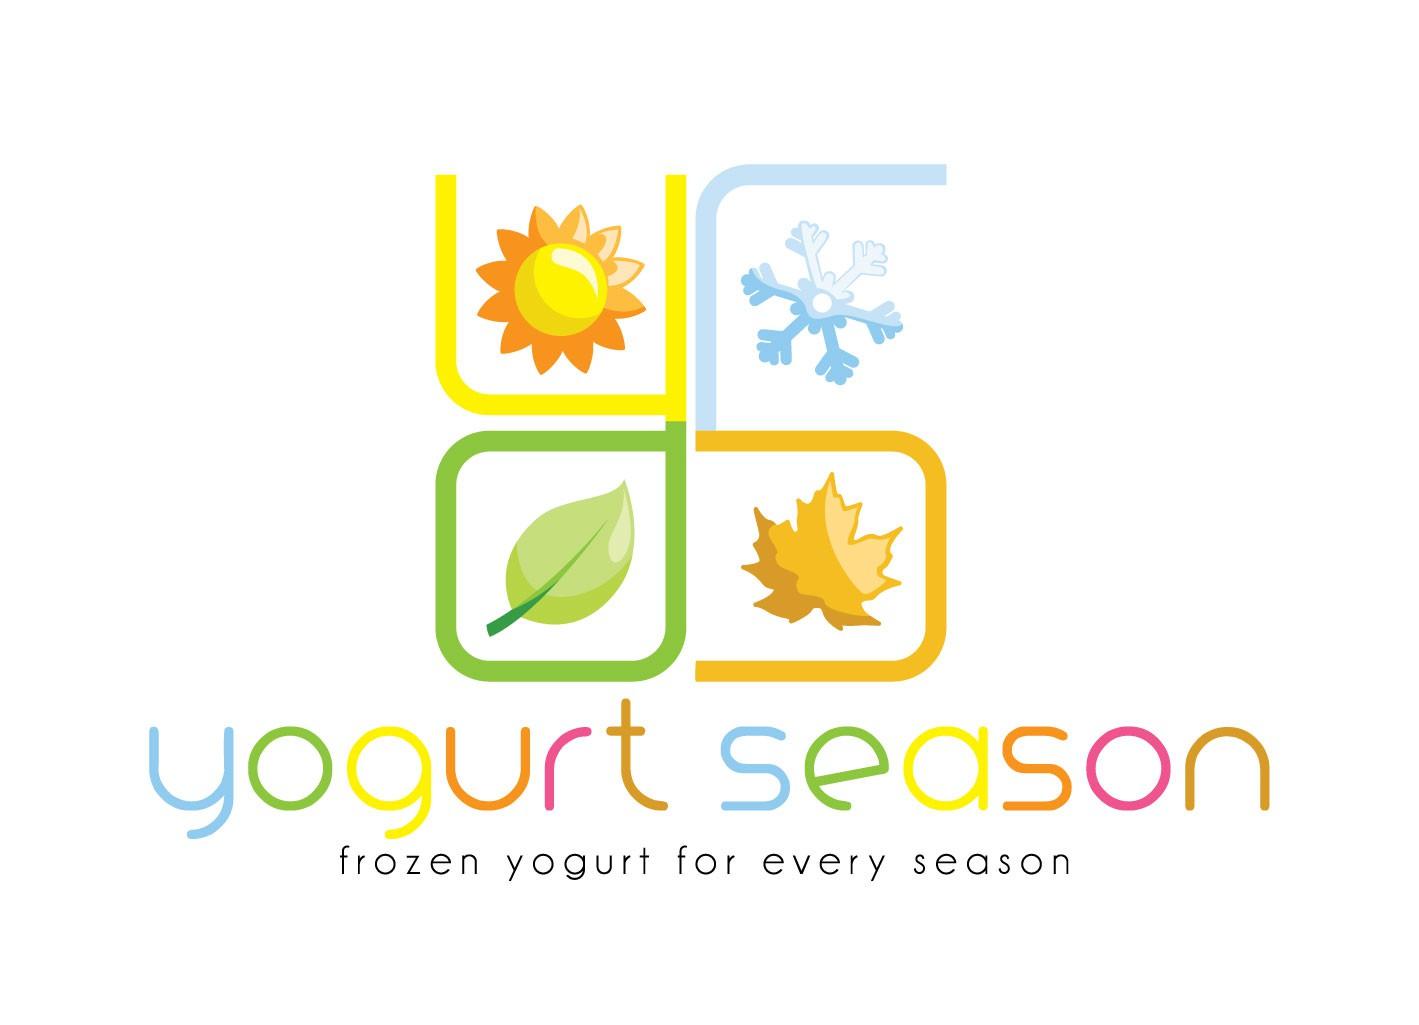 logo for yogurt season